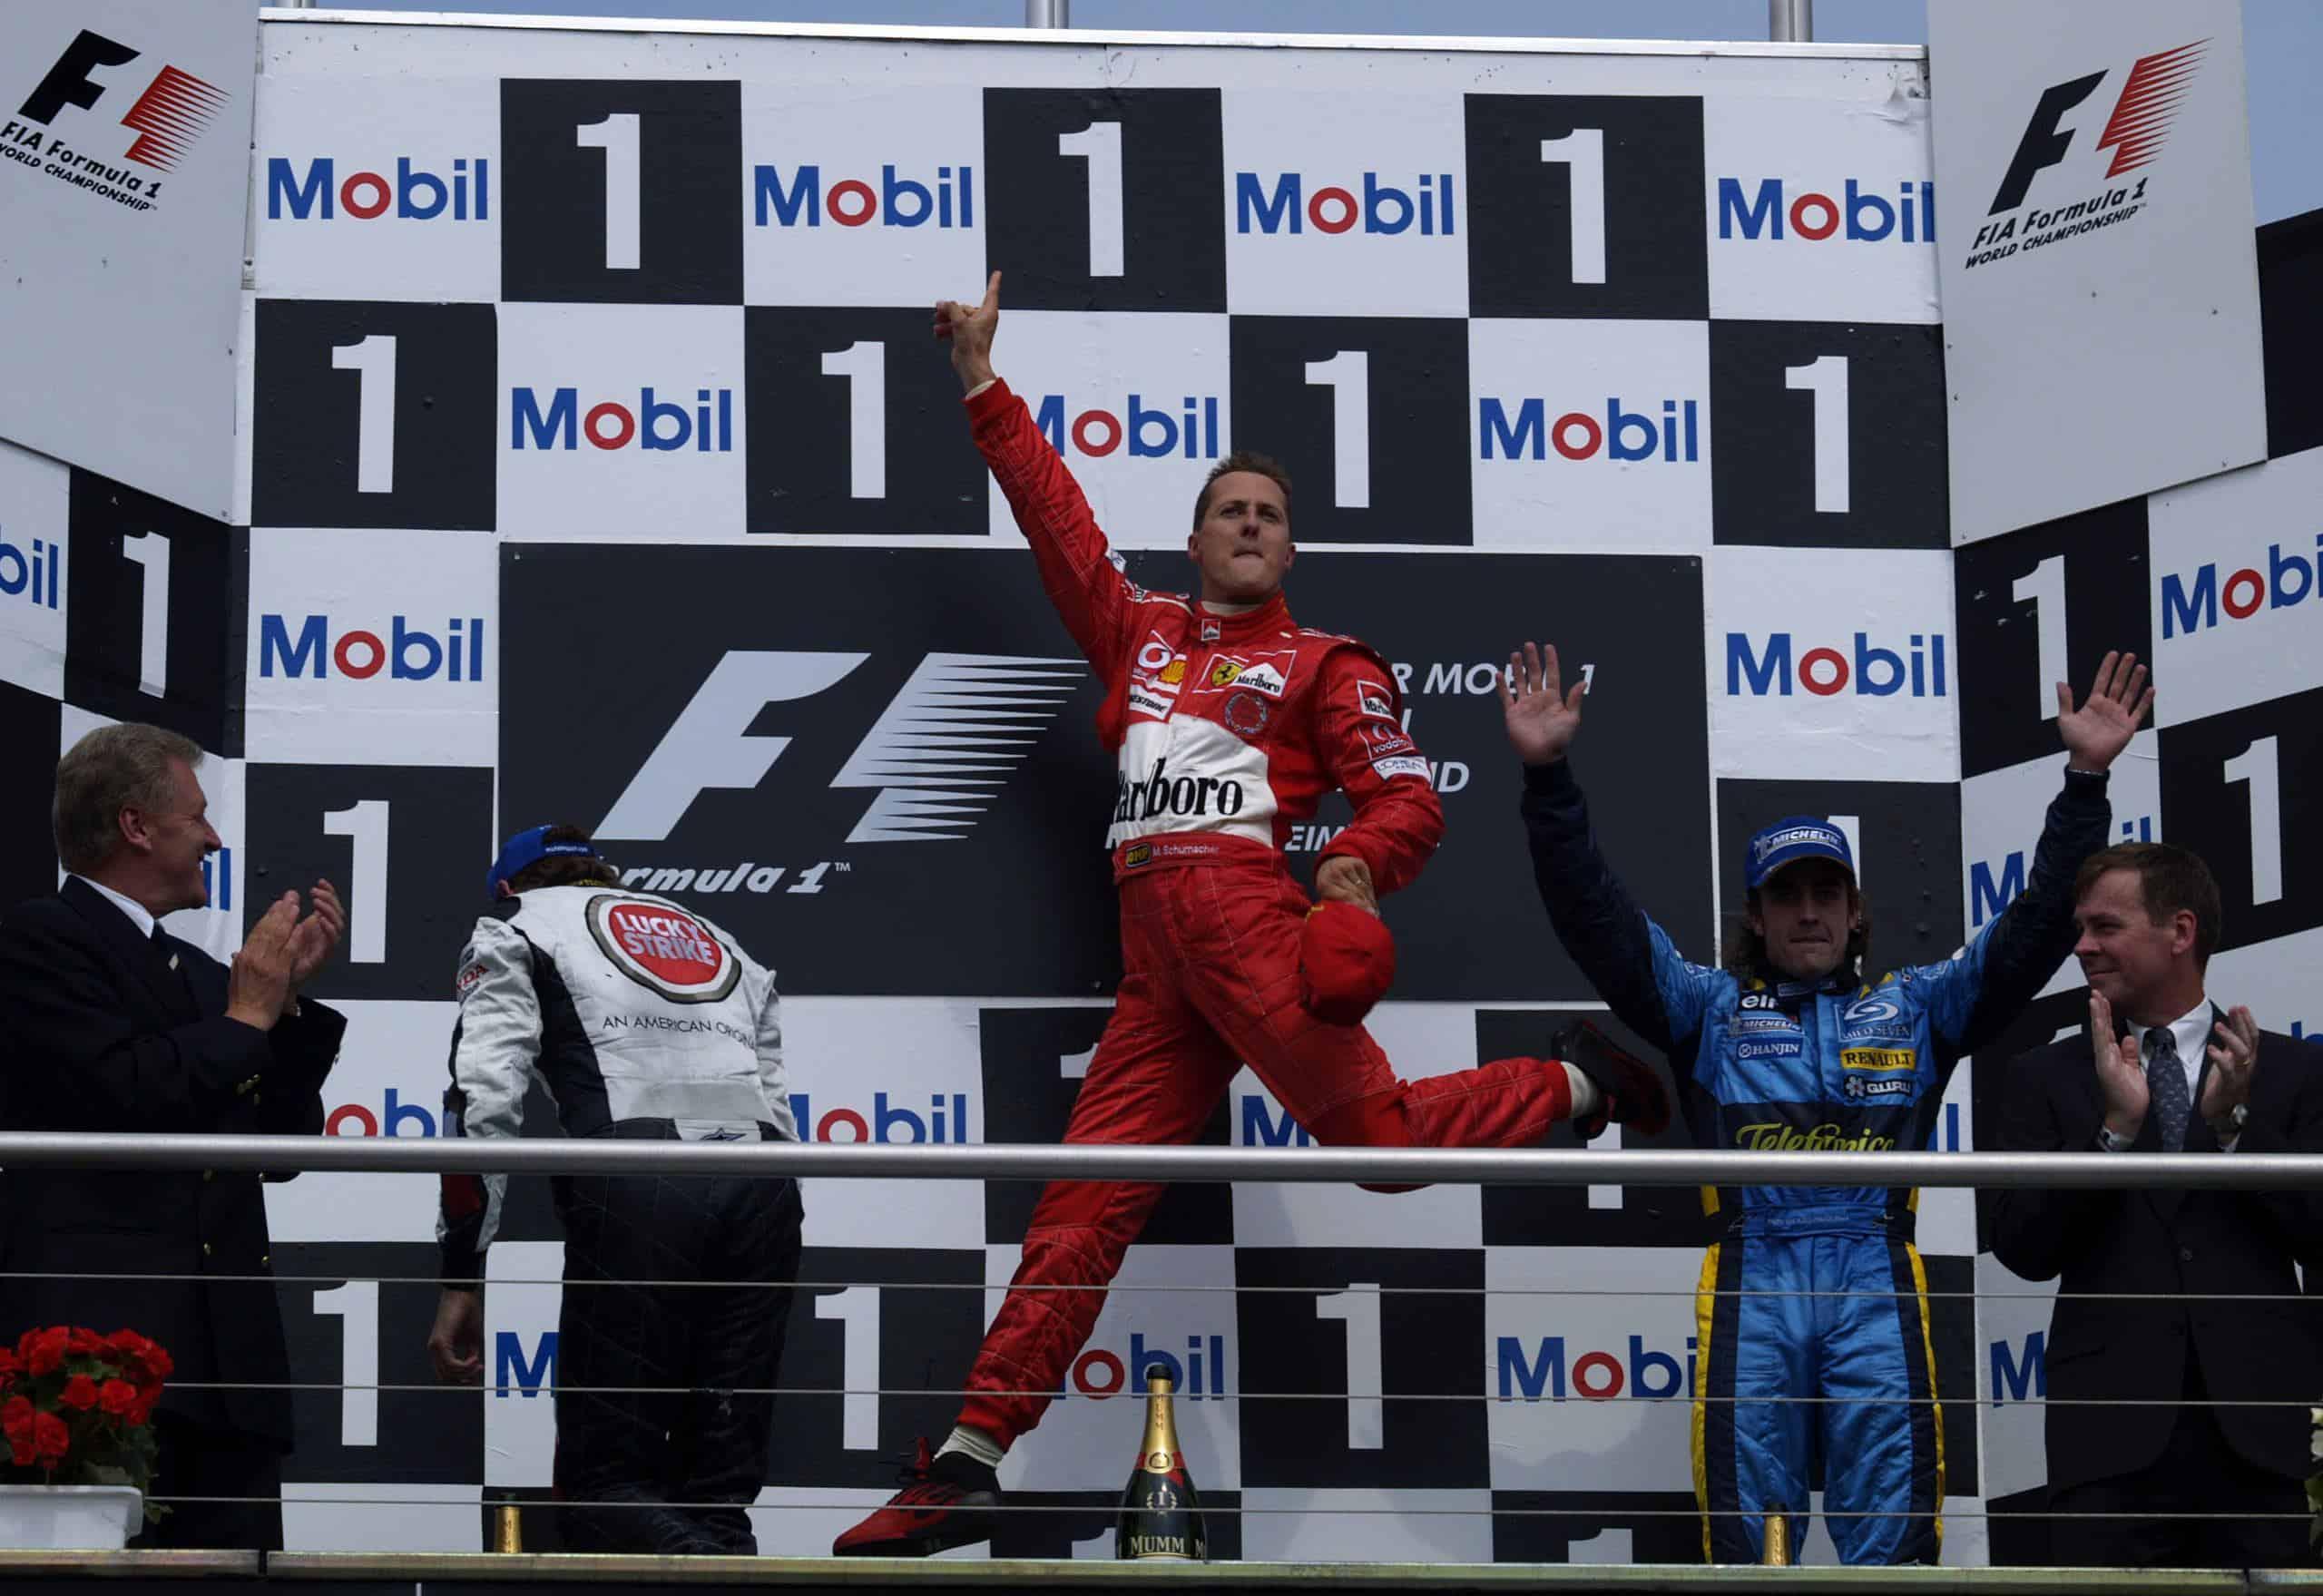 Michael-Schumacher-Ferrari-F2004-German-GP-F1-2004-on-the-podium-Hockenheim-Photo-Ferrari